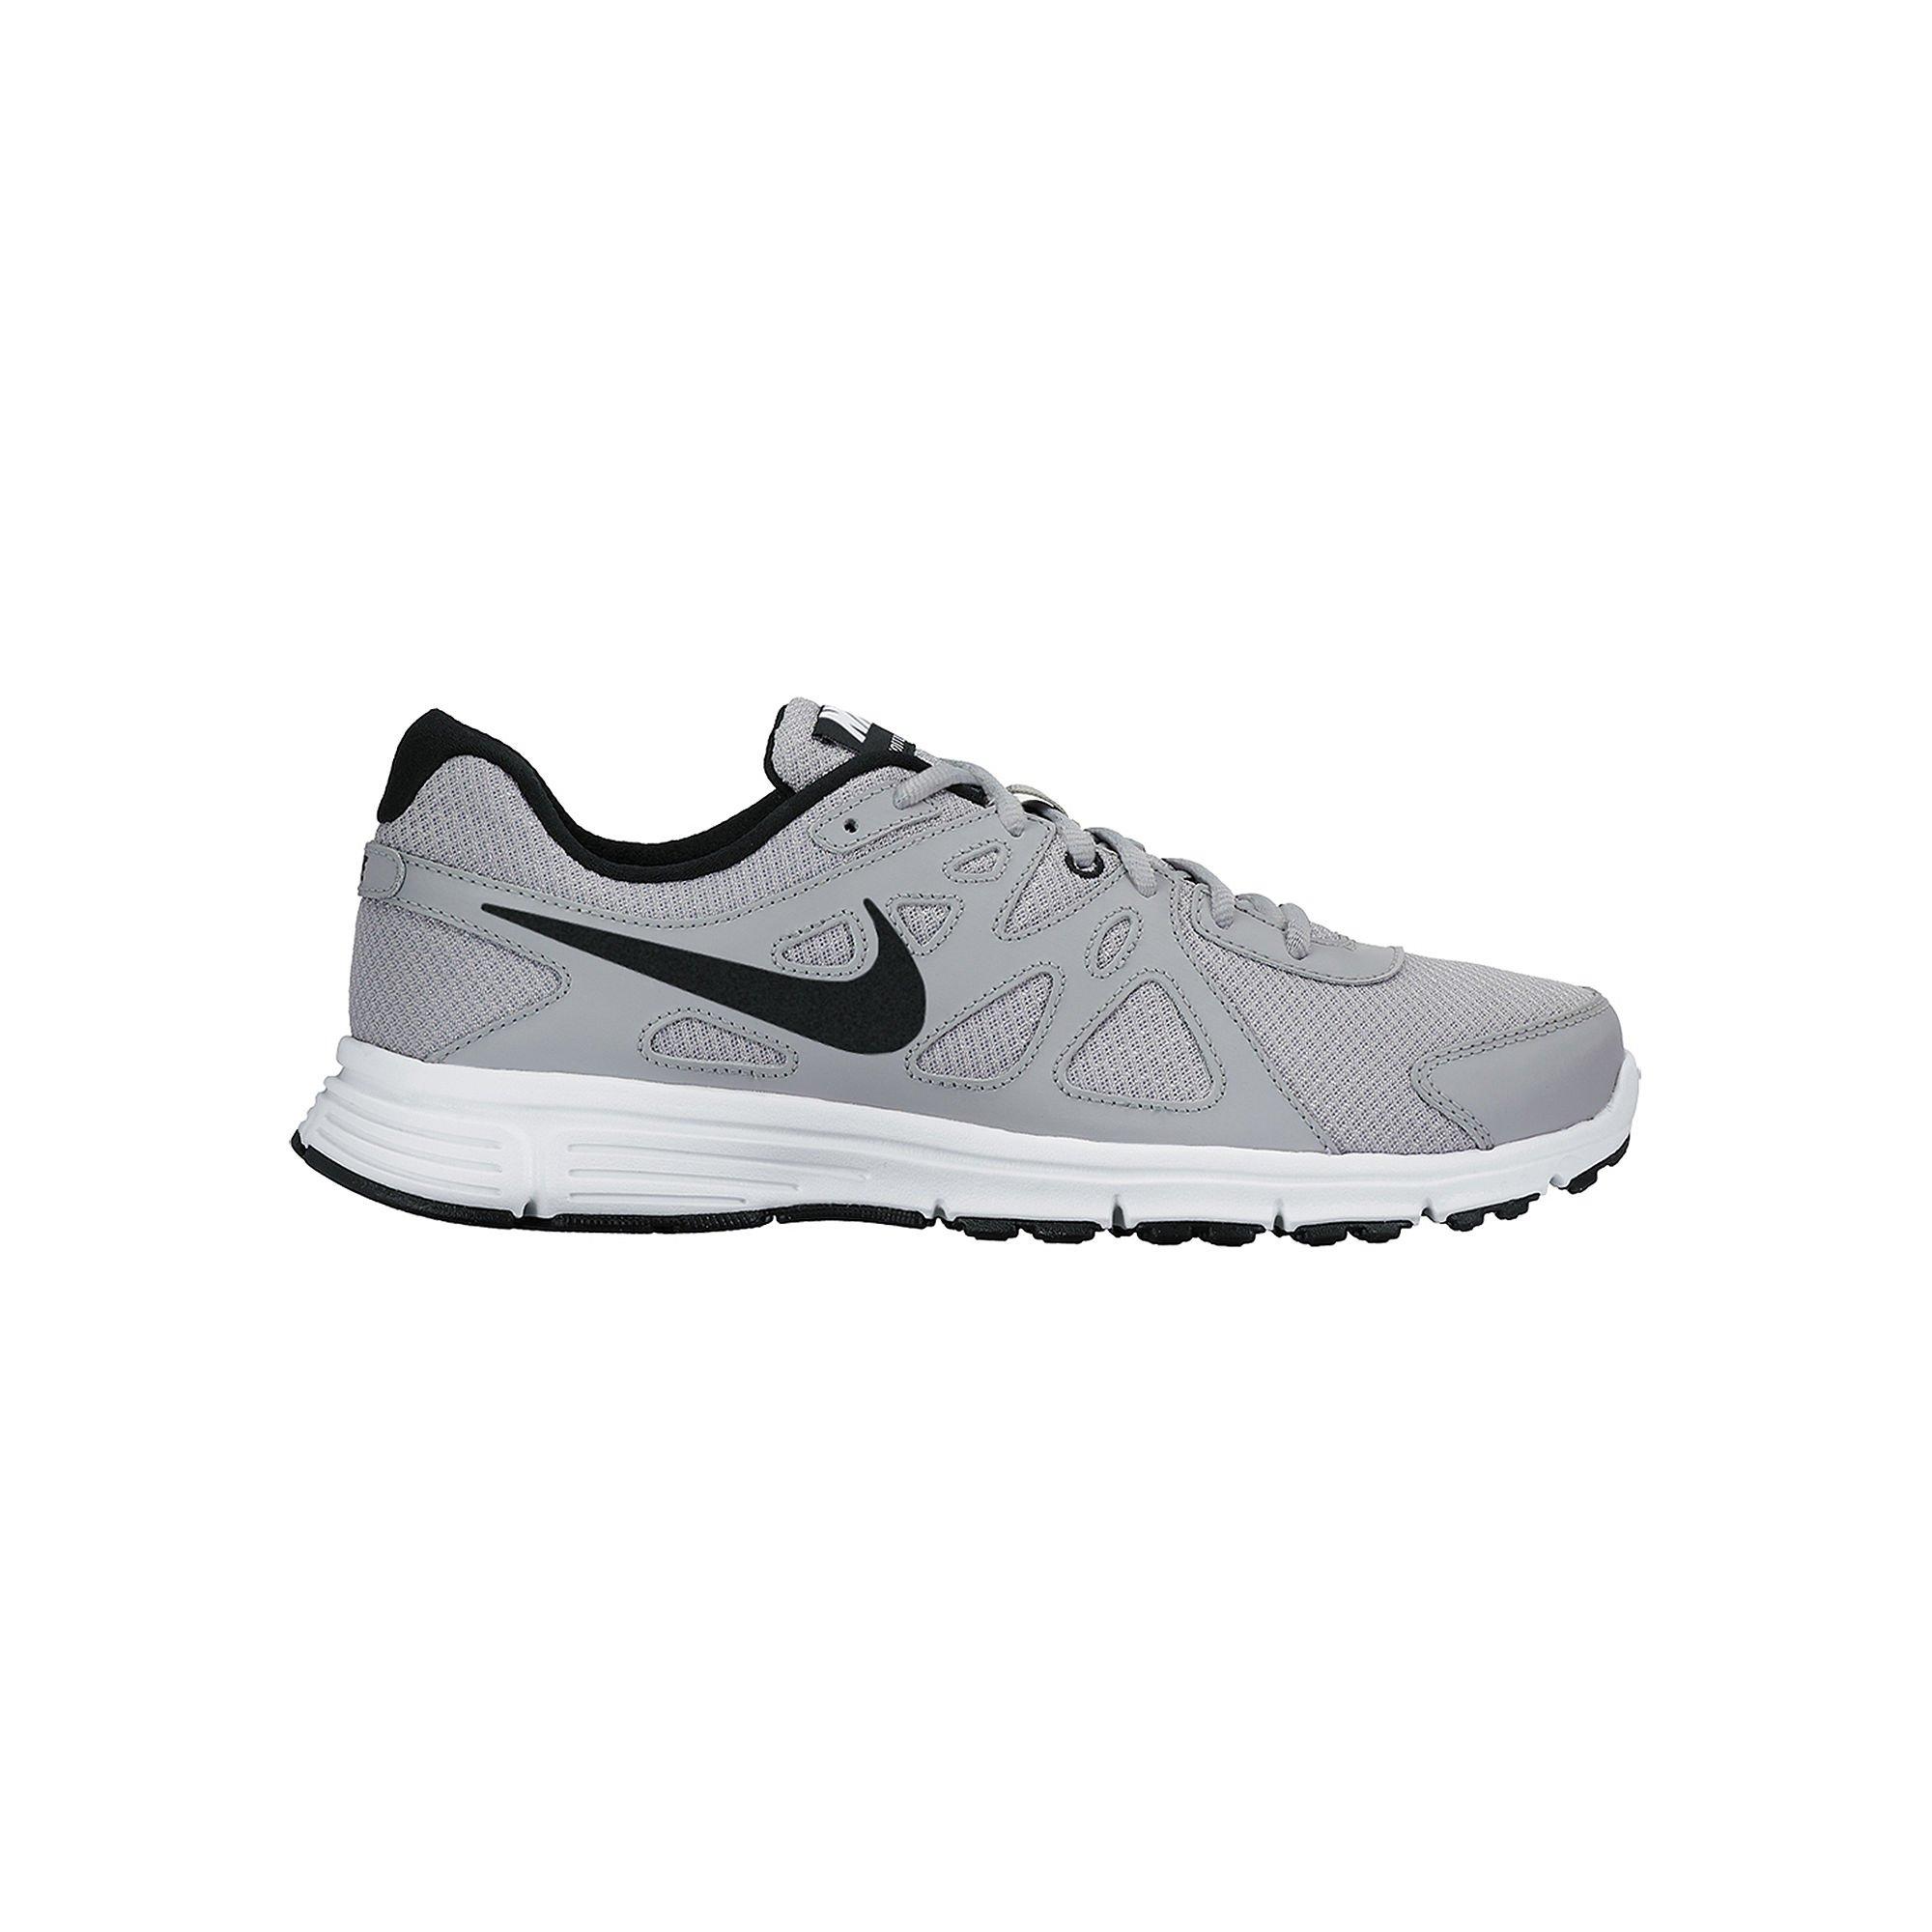 Nike Men's Revolution 2 Running Shoe Wolf Grey/Black/White Size 10 M US